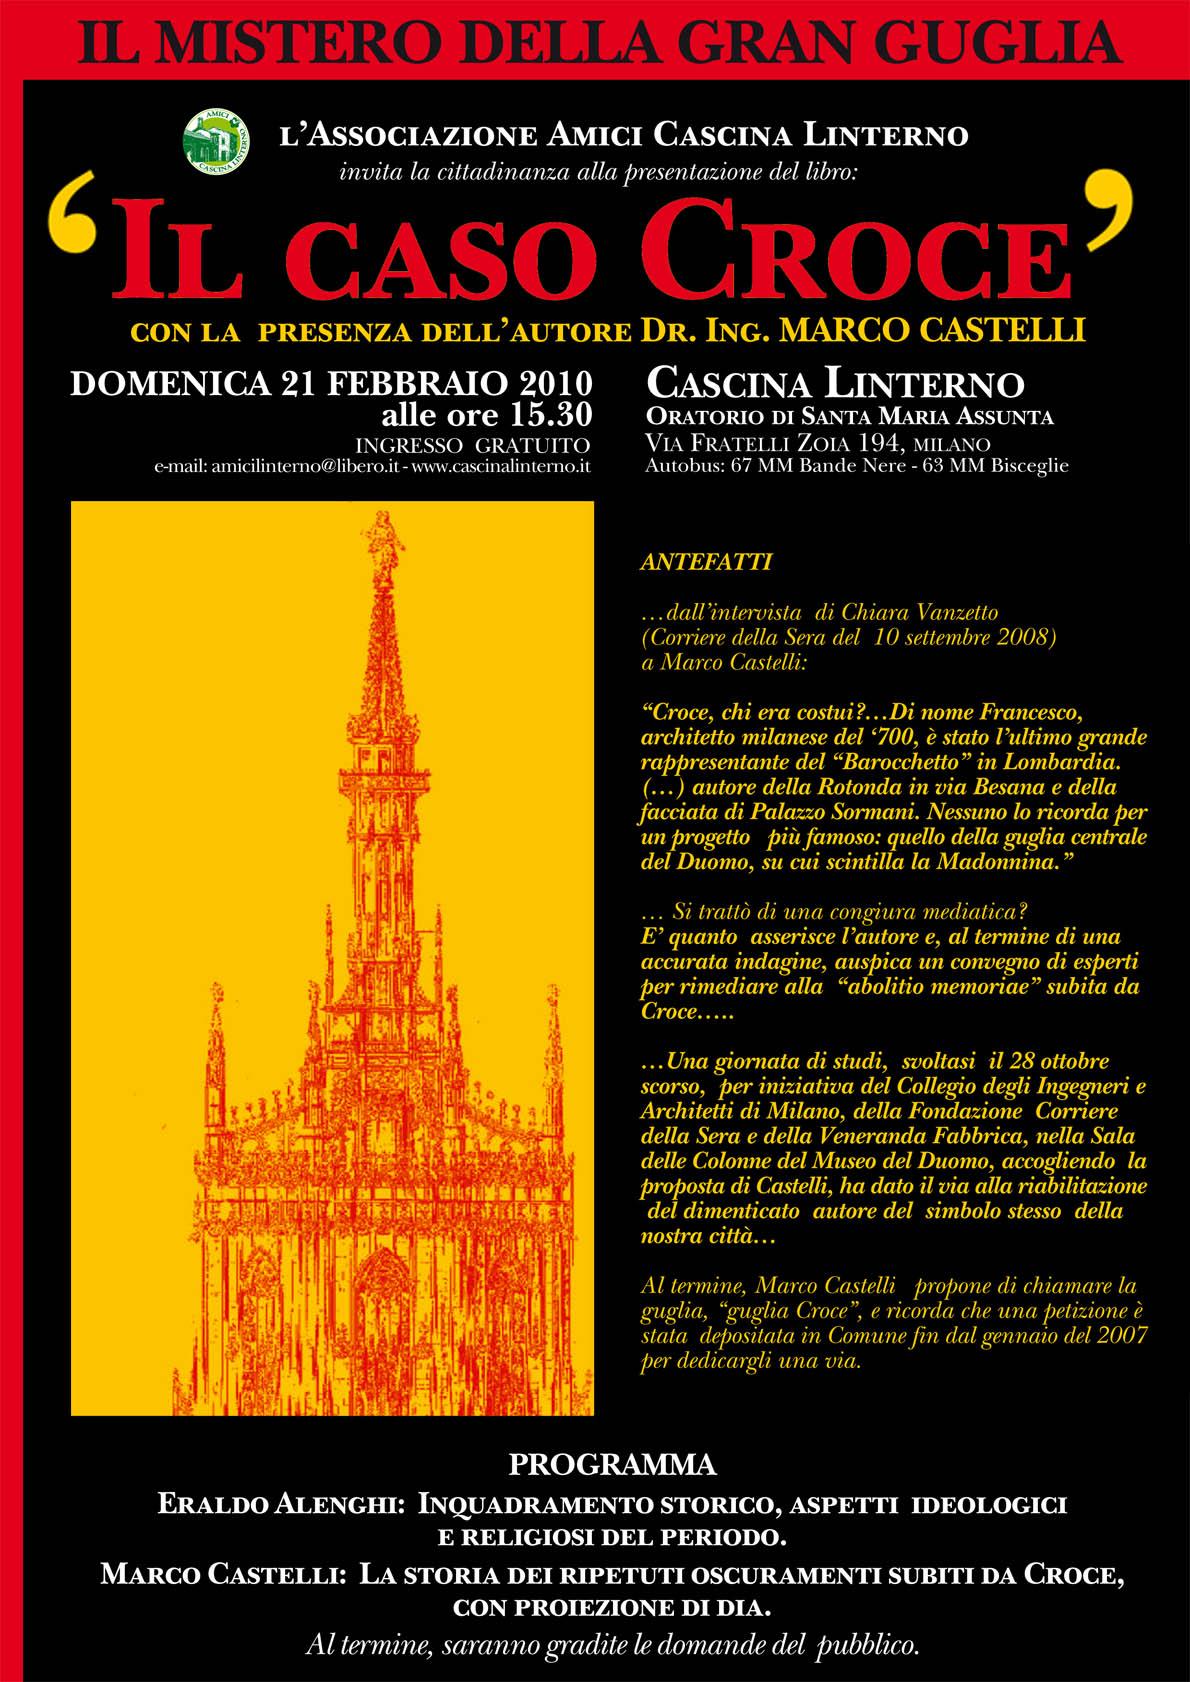 a cura di Marco Castelli e Eraldo Alenghi